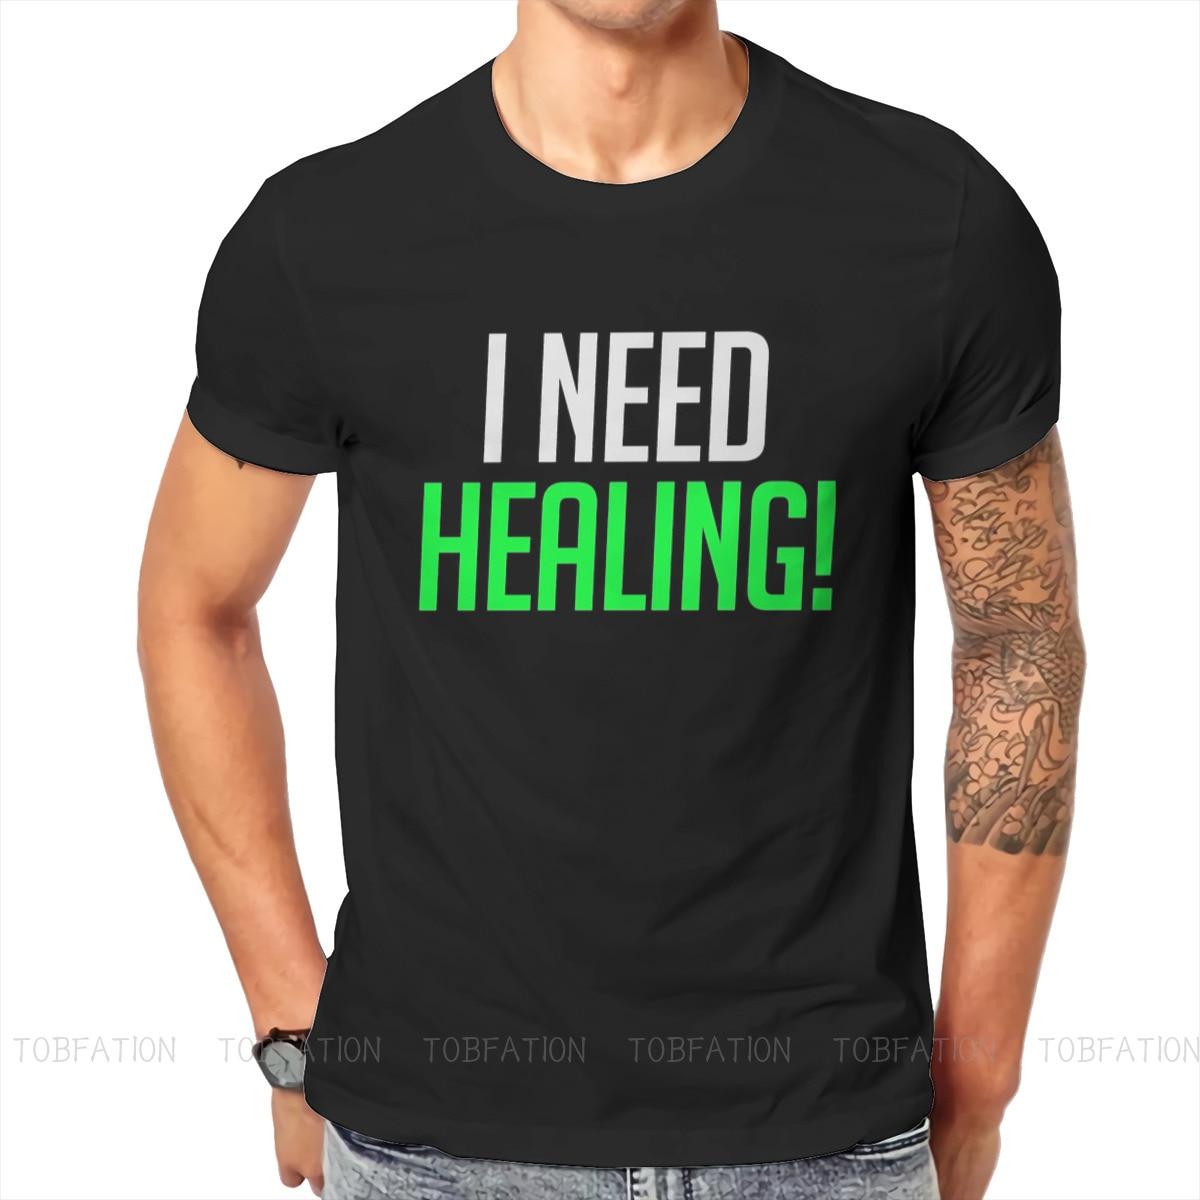 I Need Healing! Unique TShirt Overwatch Comfortable Hip Hop Gift Idea  T Shirt Short Sleeve Hot Sale